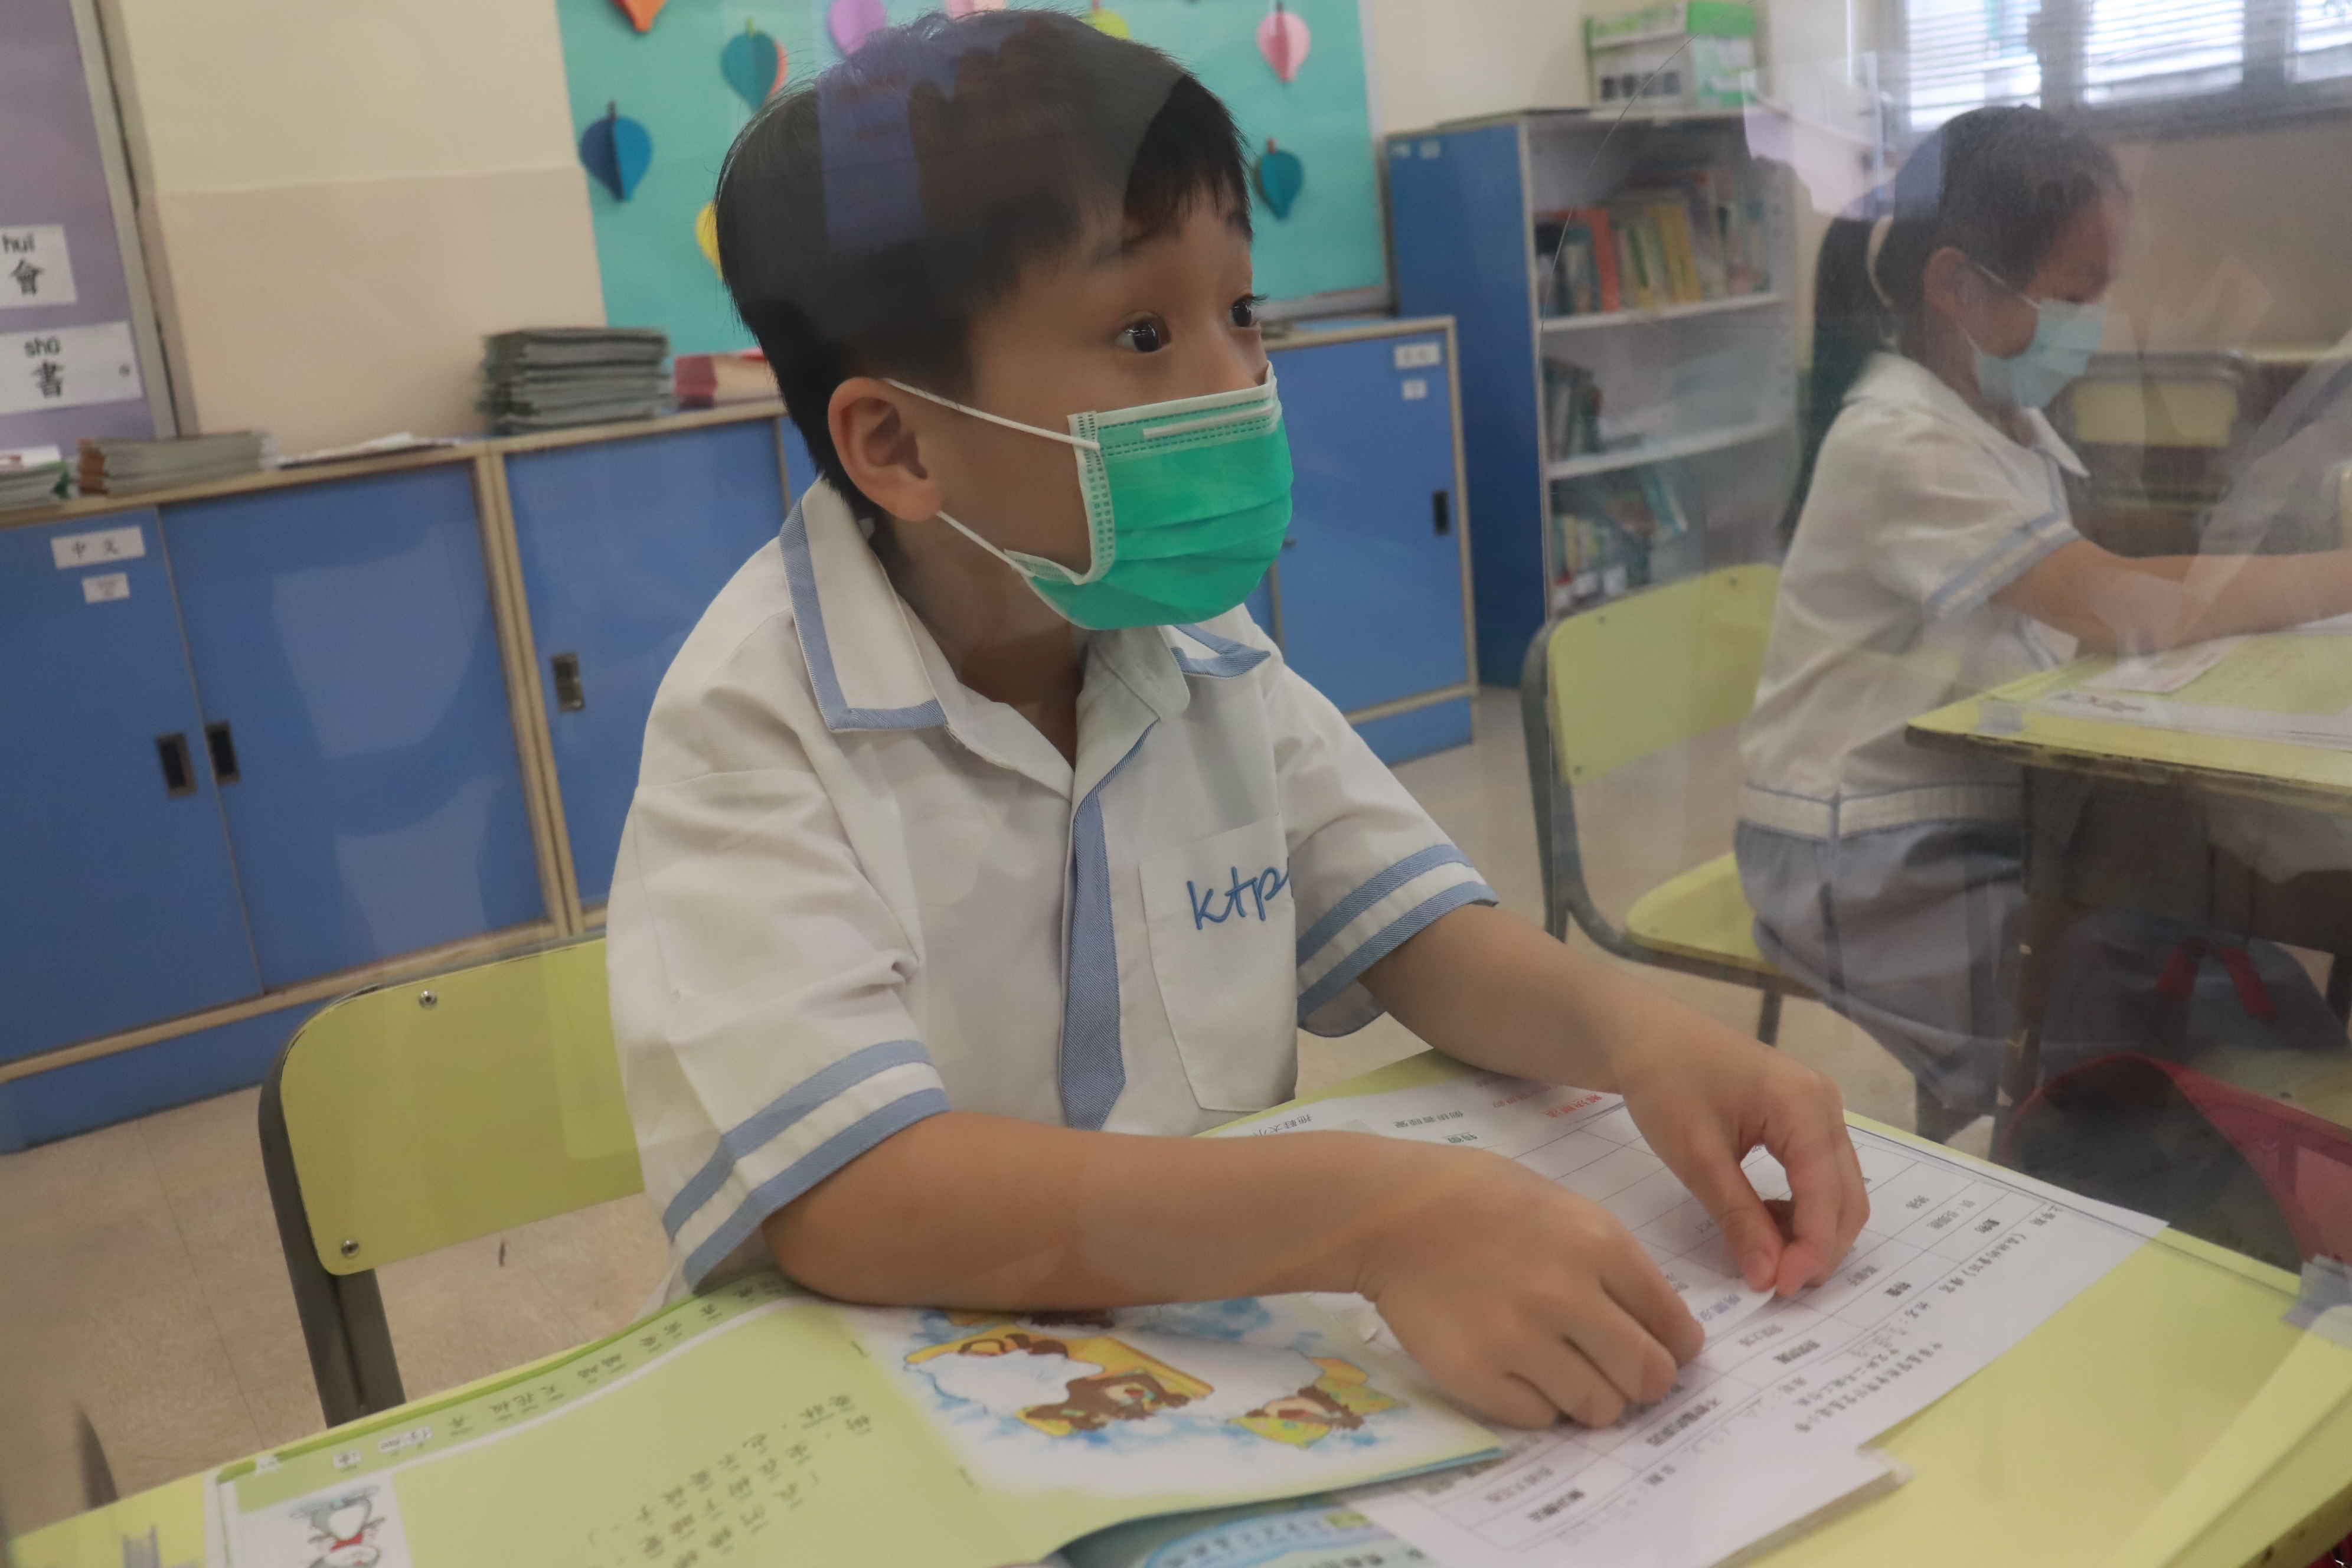 http://keito.school.hk/sites/default/files/img_6499.jpg